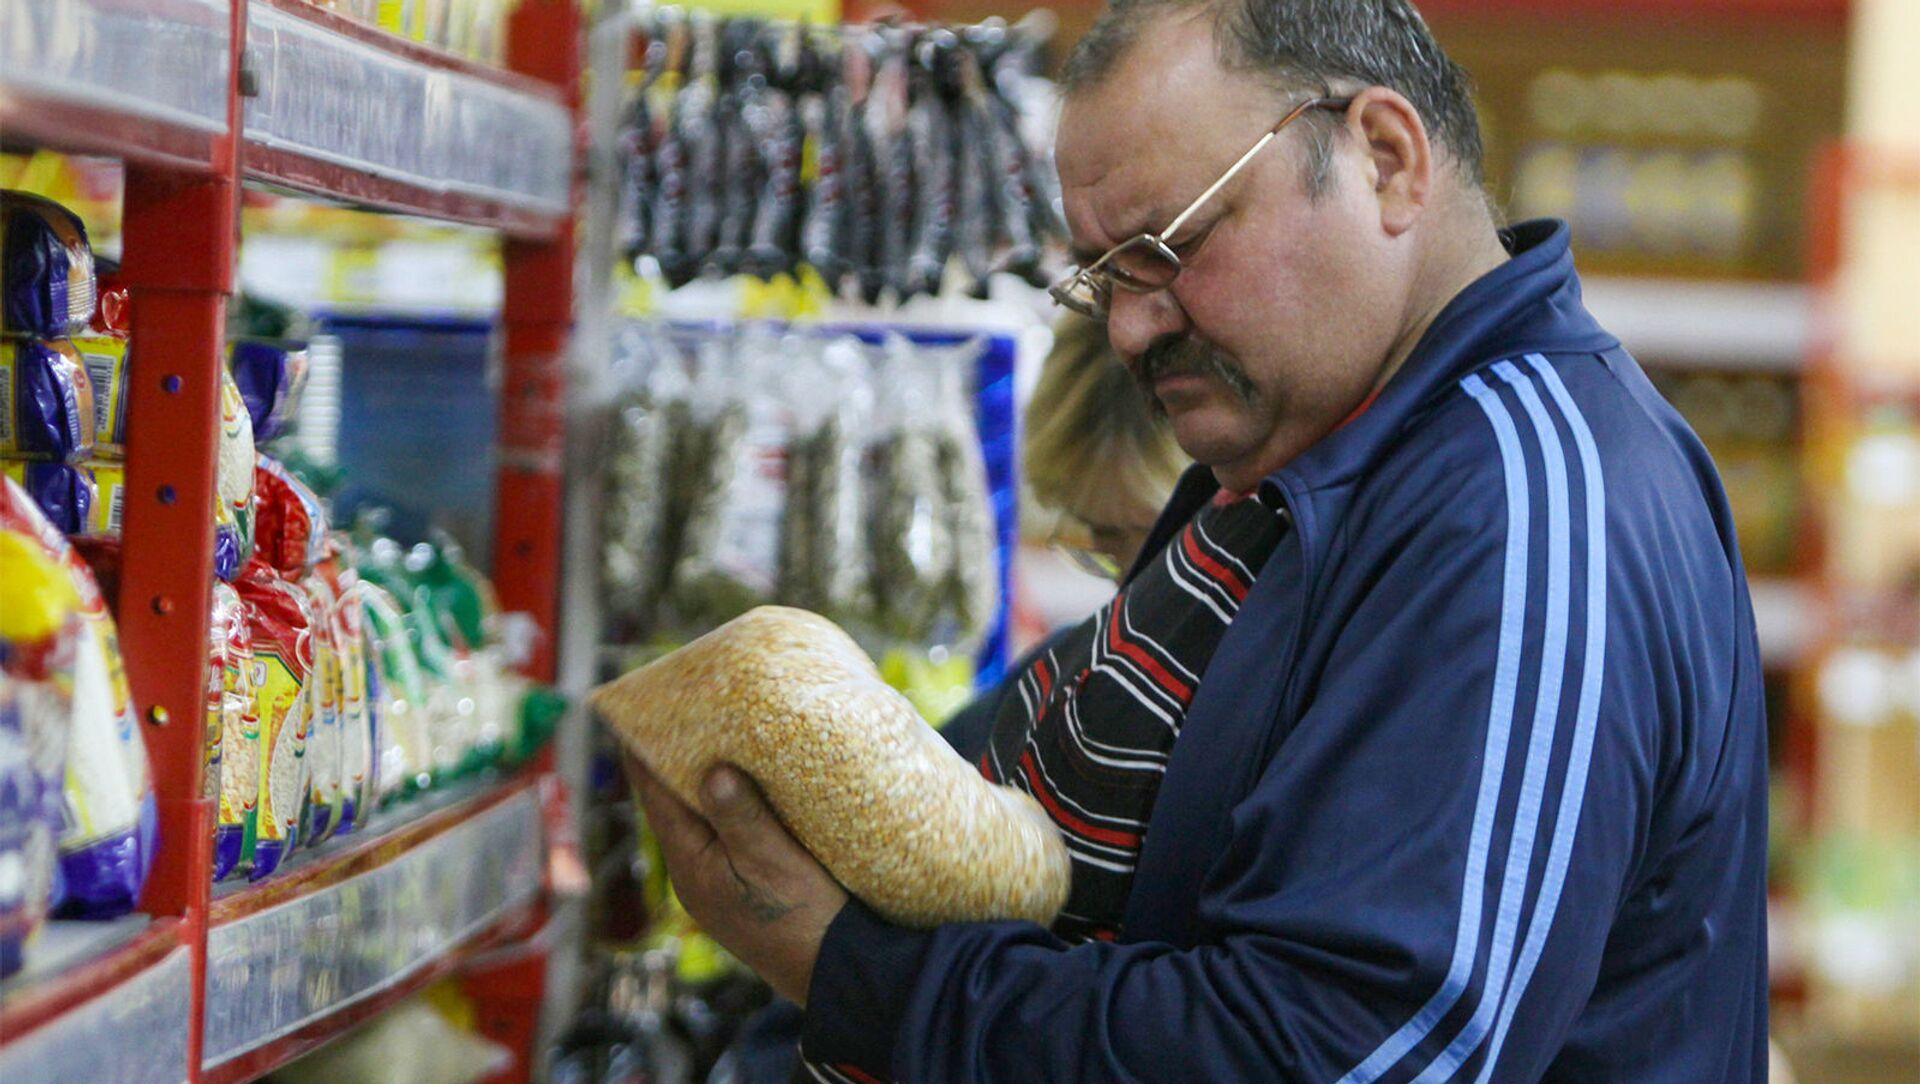 Покупатель у прилавка с крупами в супермаркете - Sputnik Արմենիա, 1920, 03.08.2021